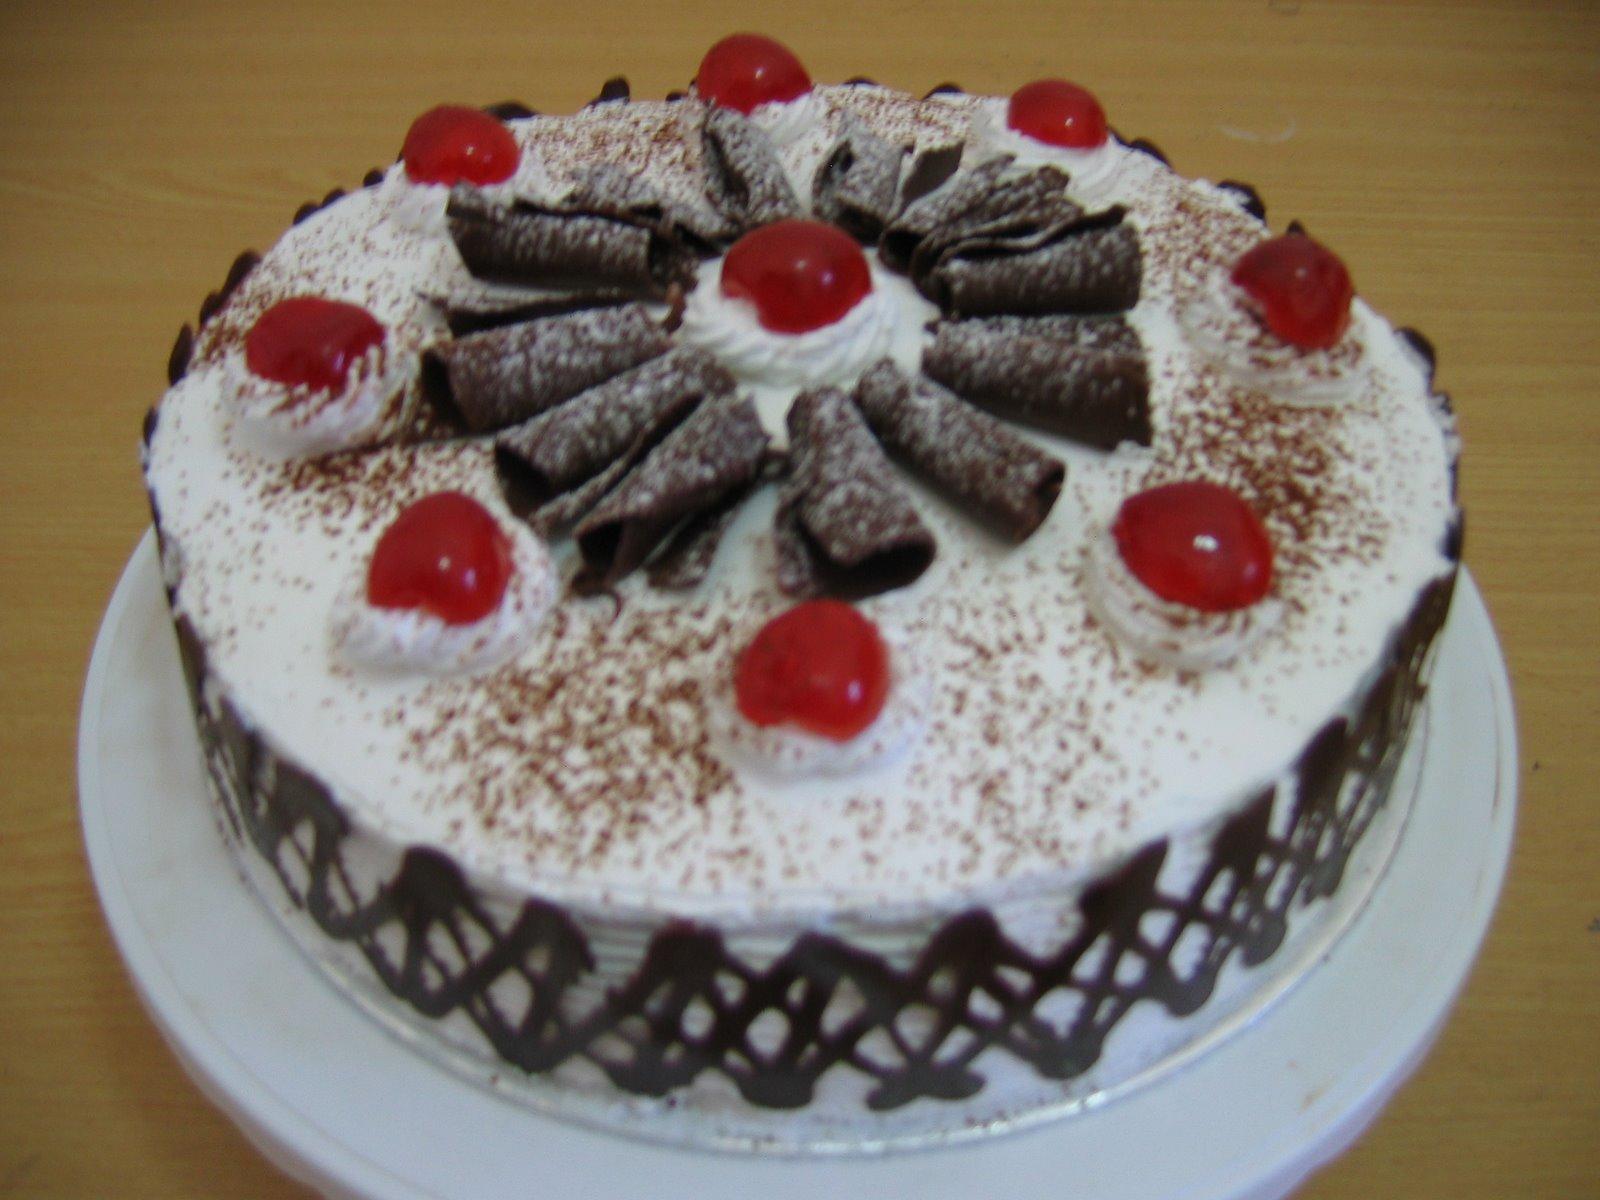 Berikut resep dan cara membuat kue tart coklat kacang resep membuat